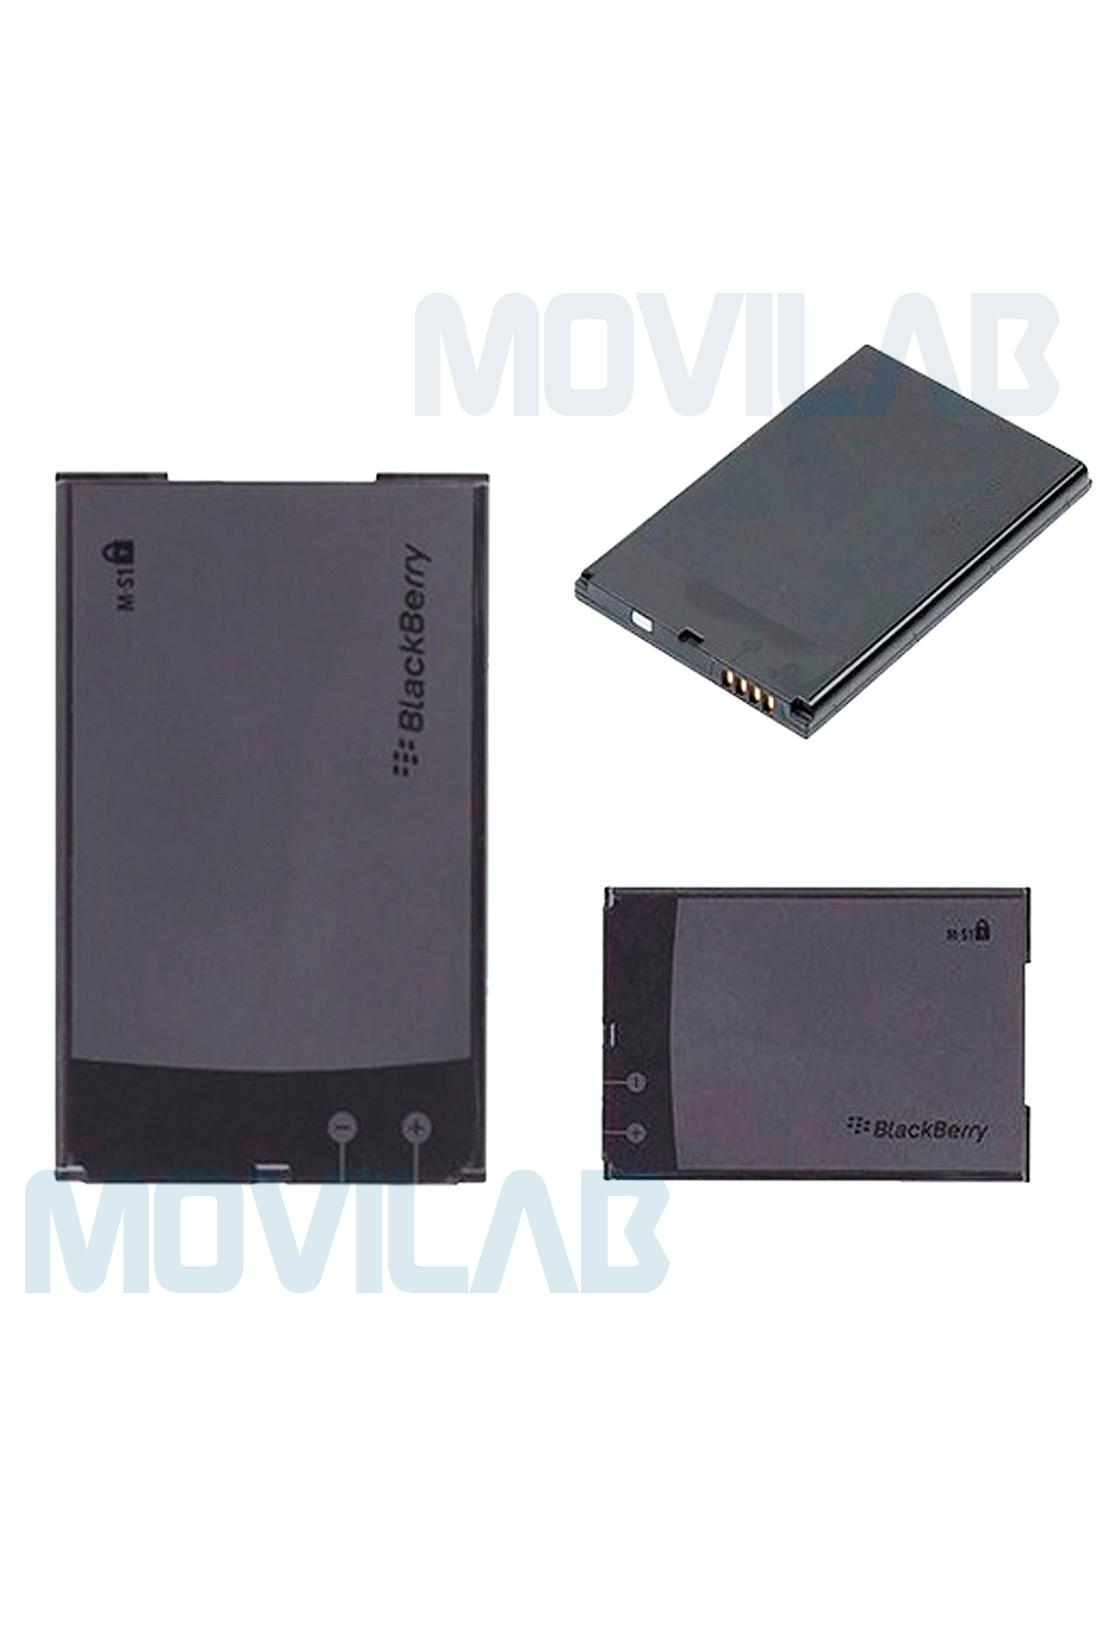 Batería Original Blackberry M-S1 9000 / 9700 OEM